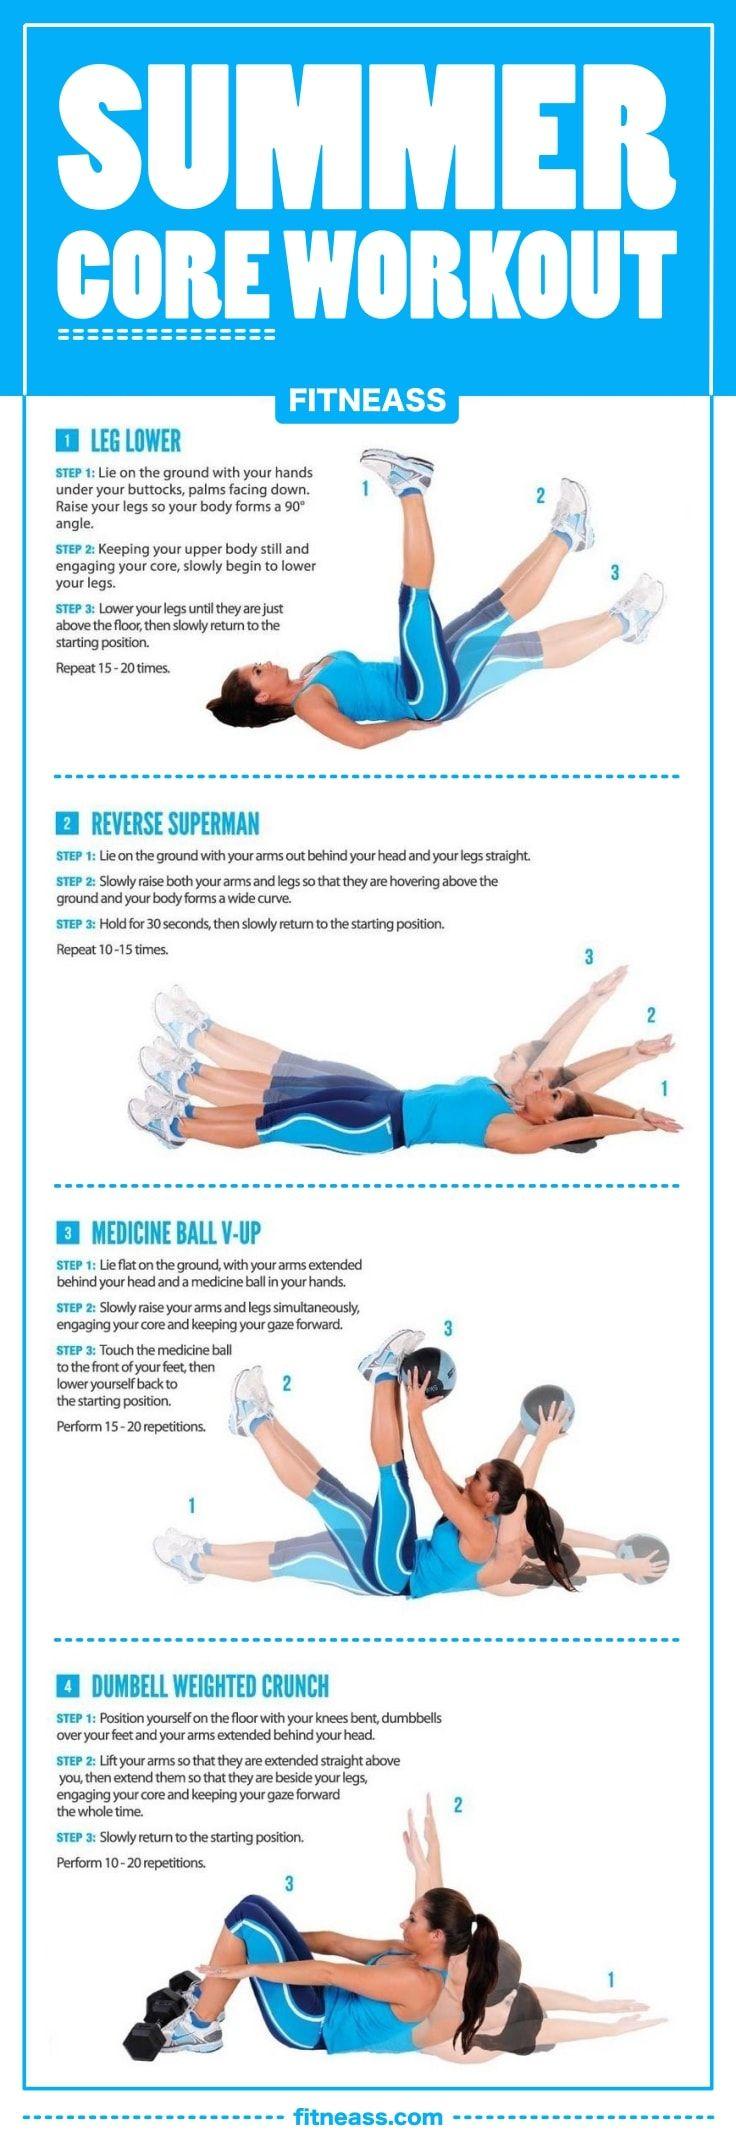 Desi diet plan for bodybuilding in hindi image 3